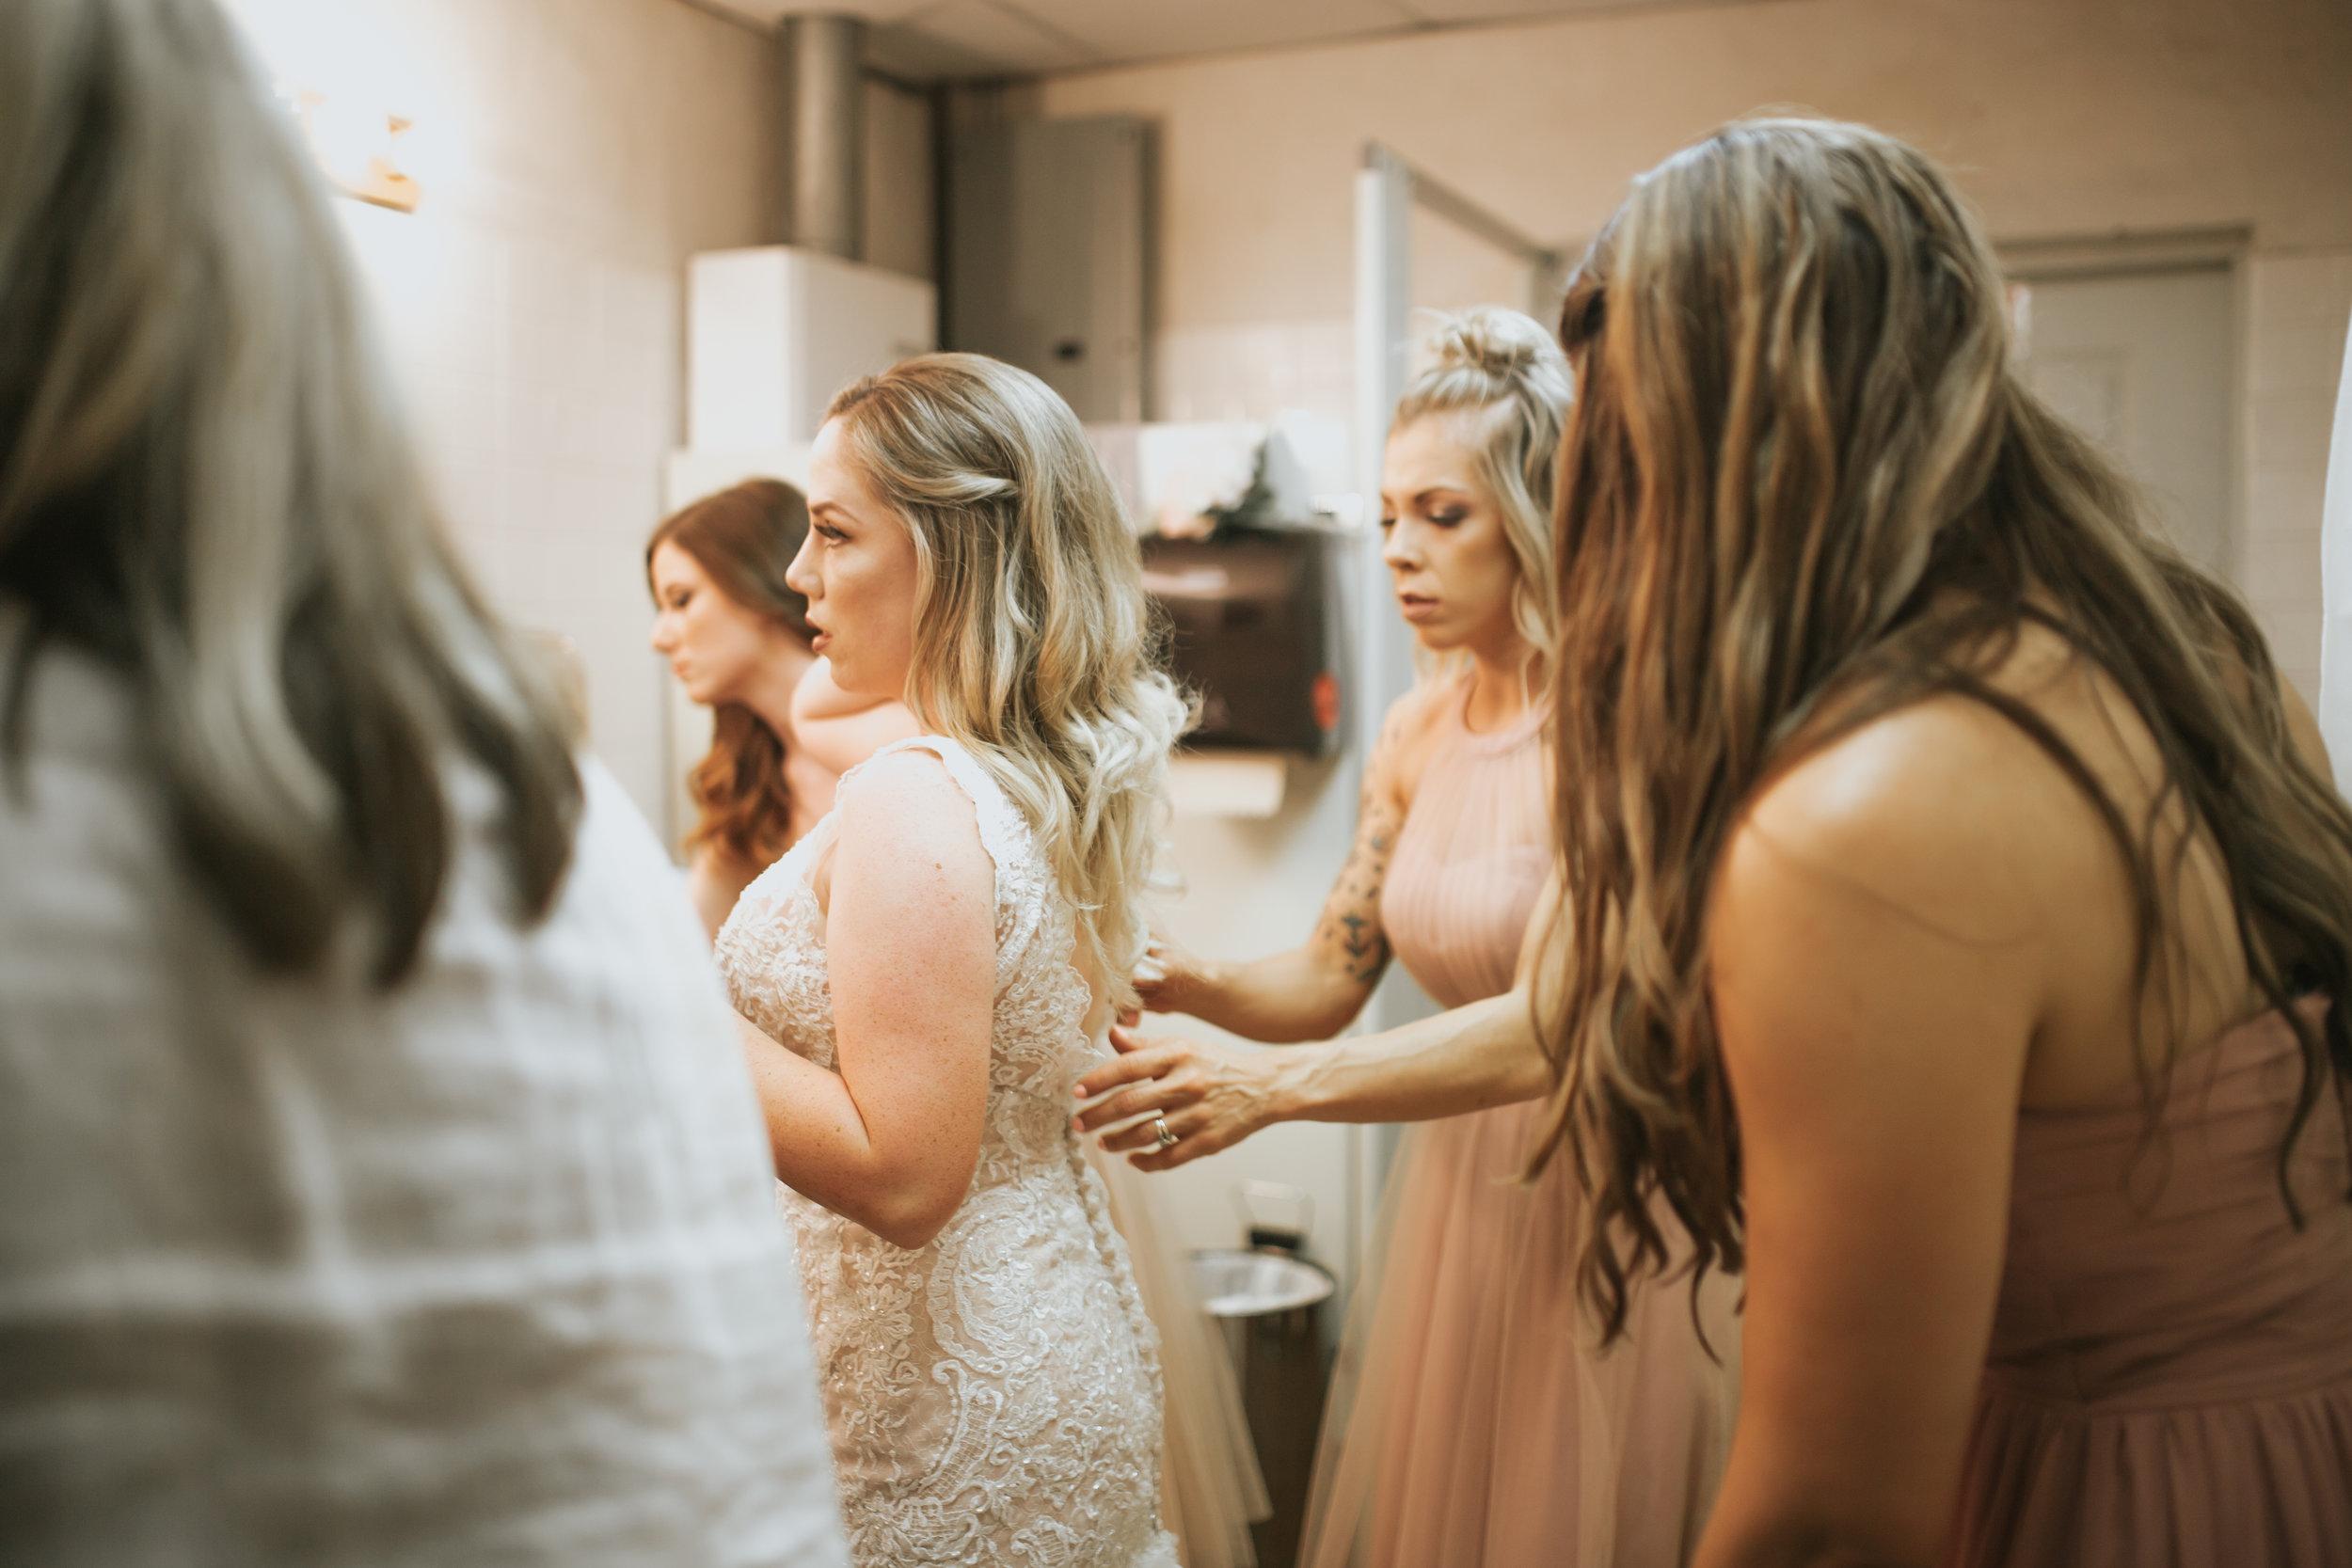 william-taylor-fabens-texas-wedding-21